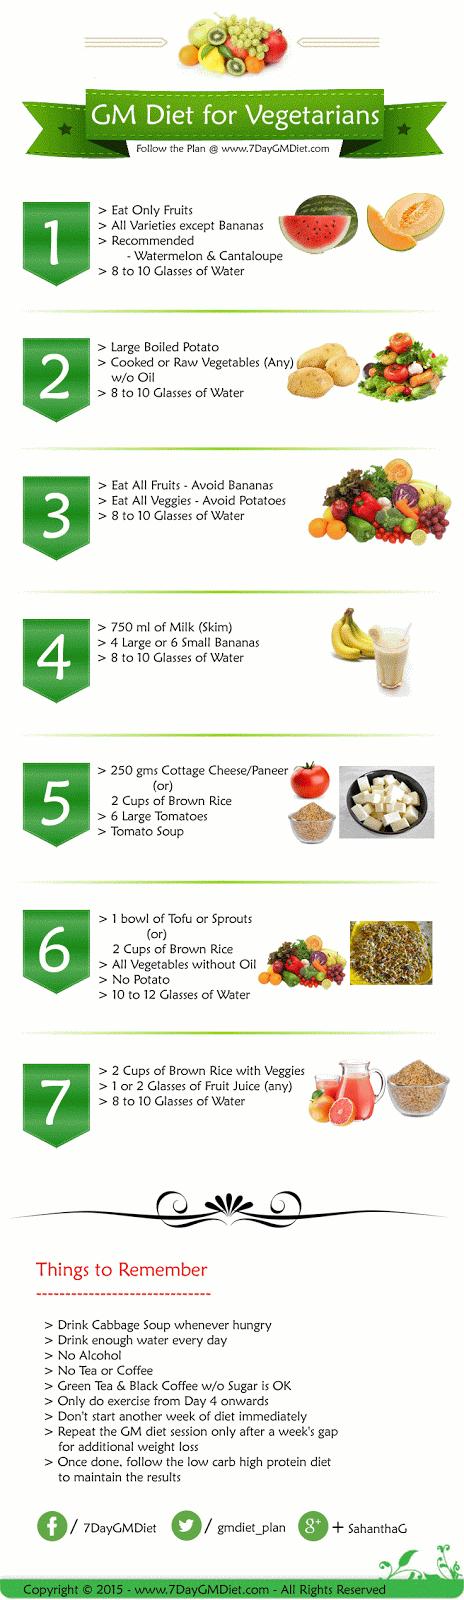 Diet Gm Menu : Vegetarian, Plan:, Follow, Vegetarians, 15…, Plans,, General, Motors, Diet,